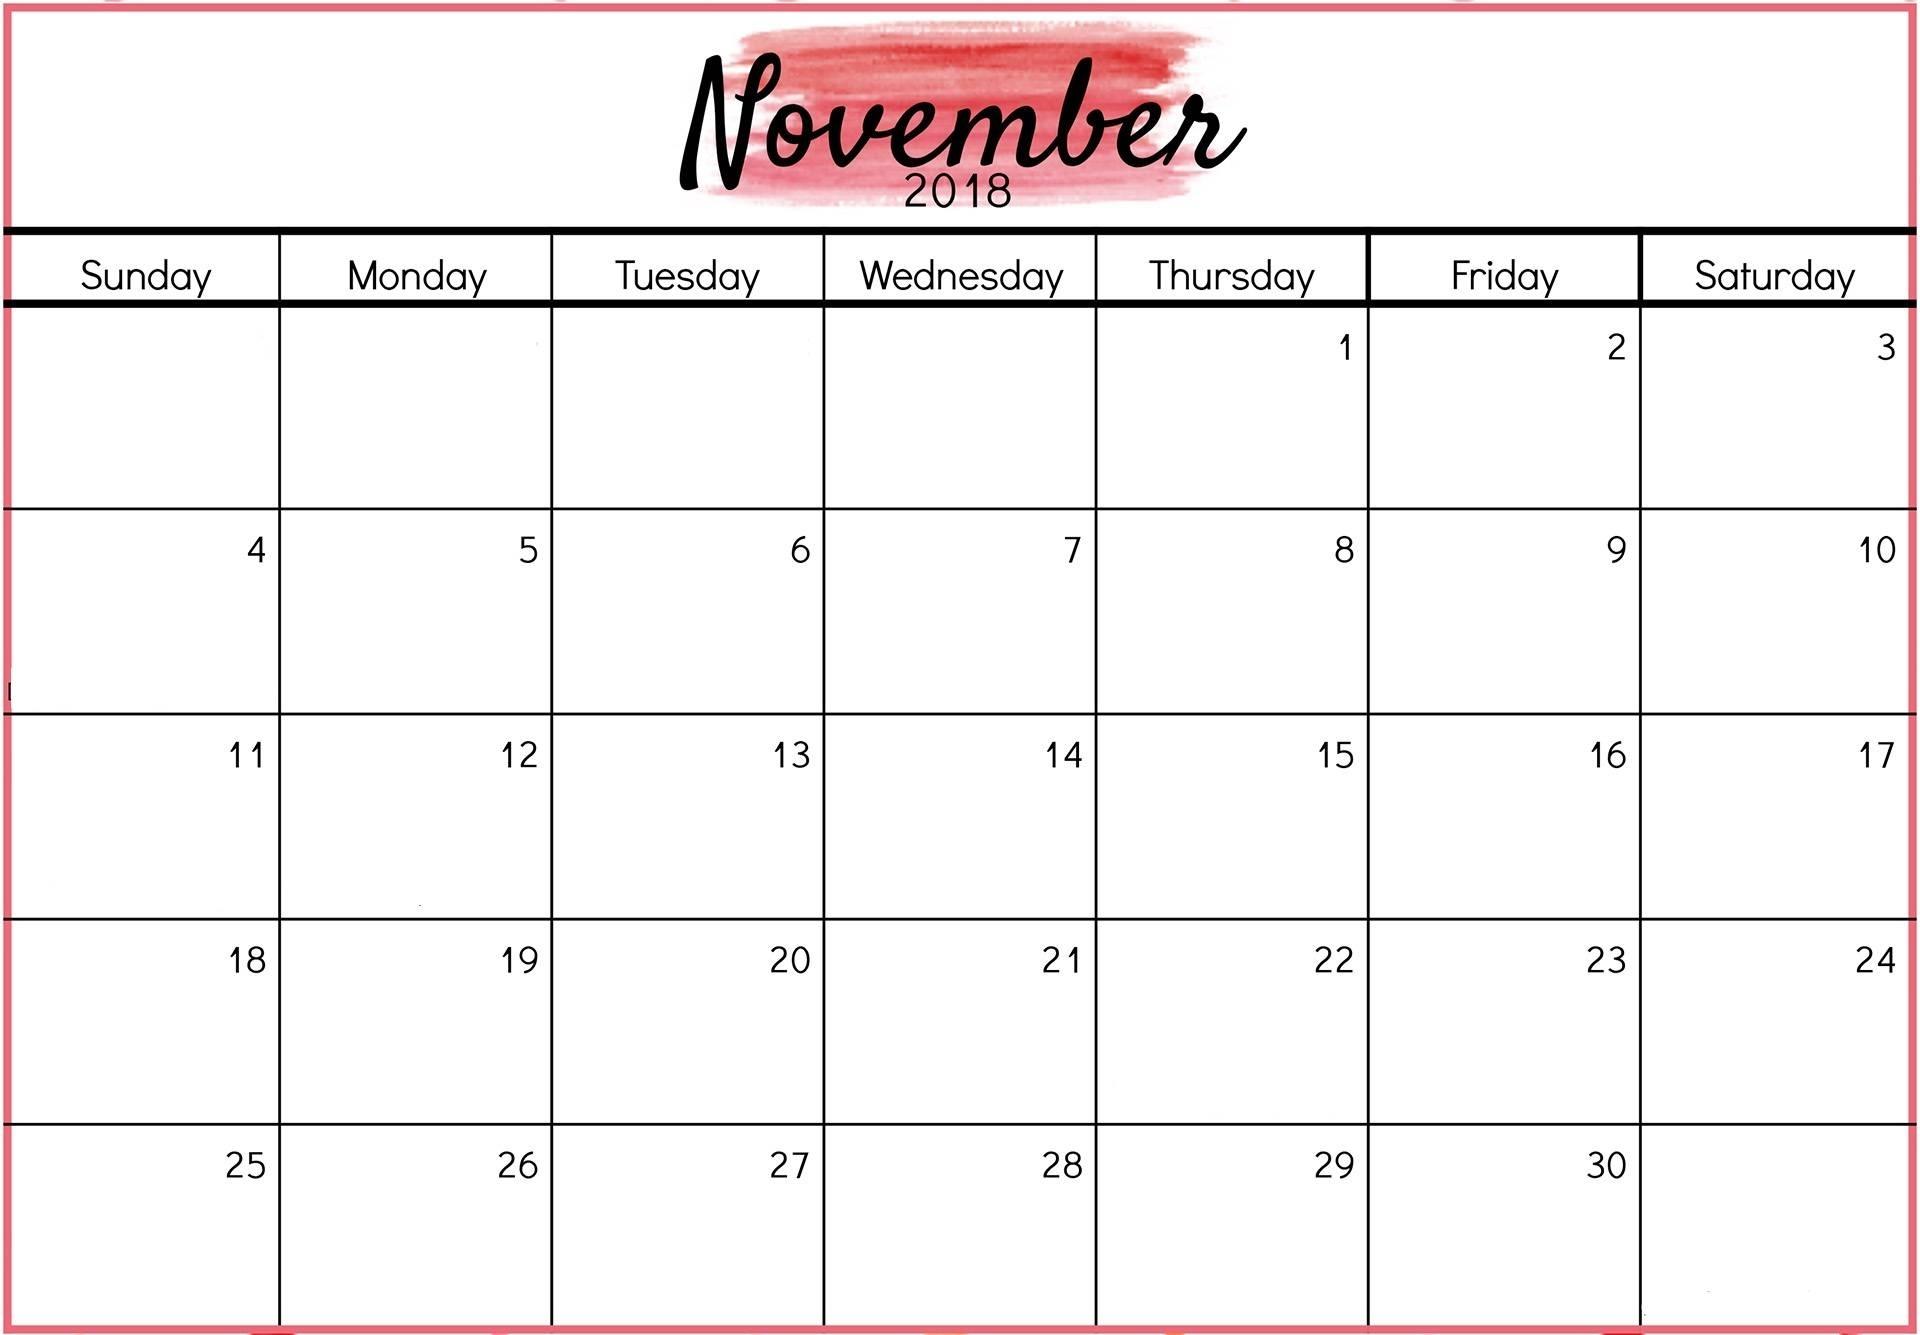 Collect November 2018 Calendar Printable Monthly